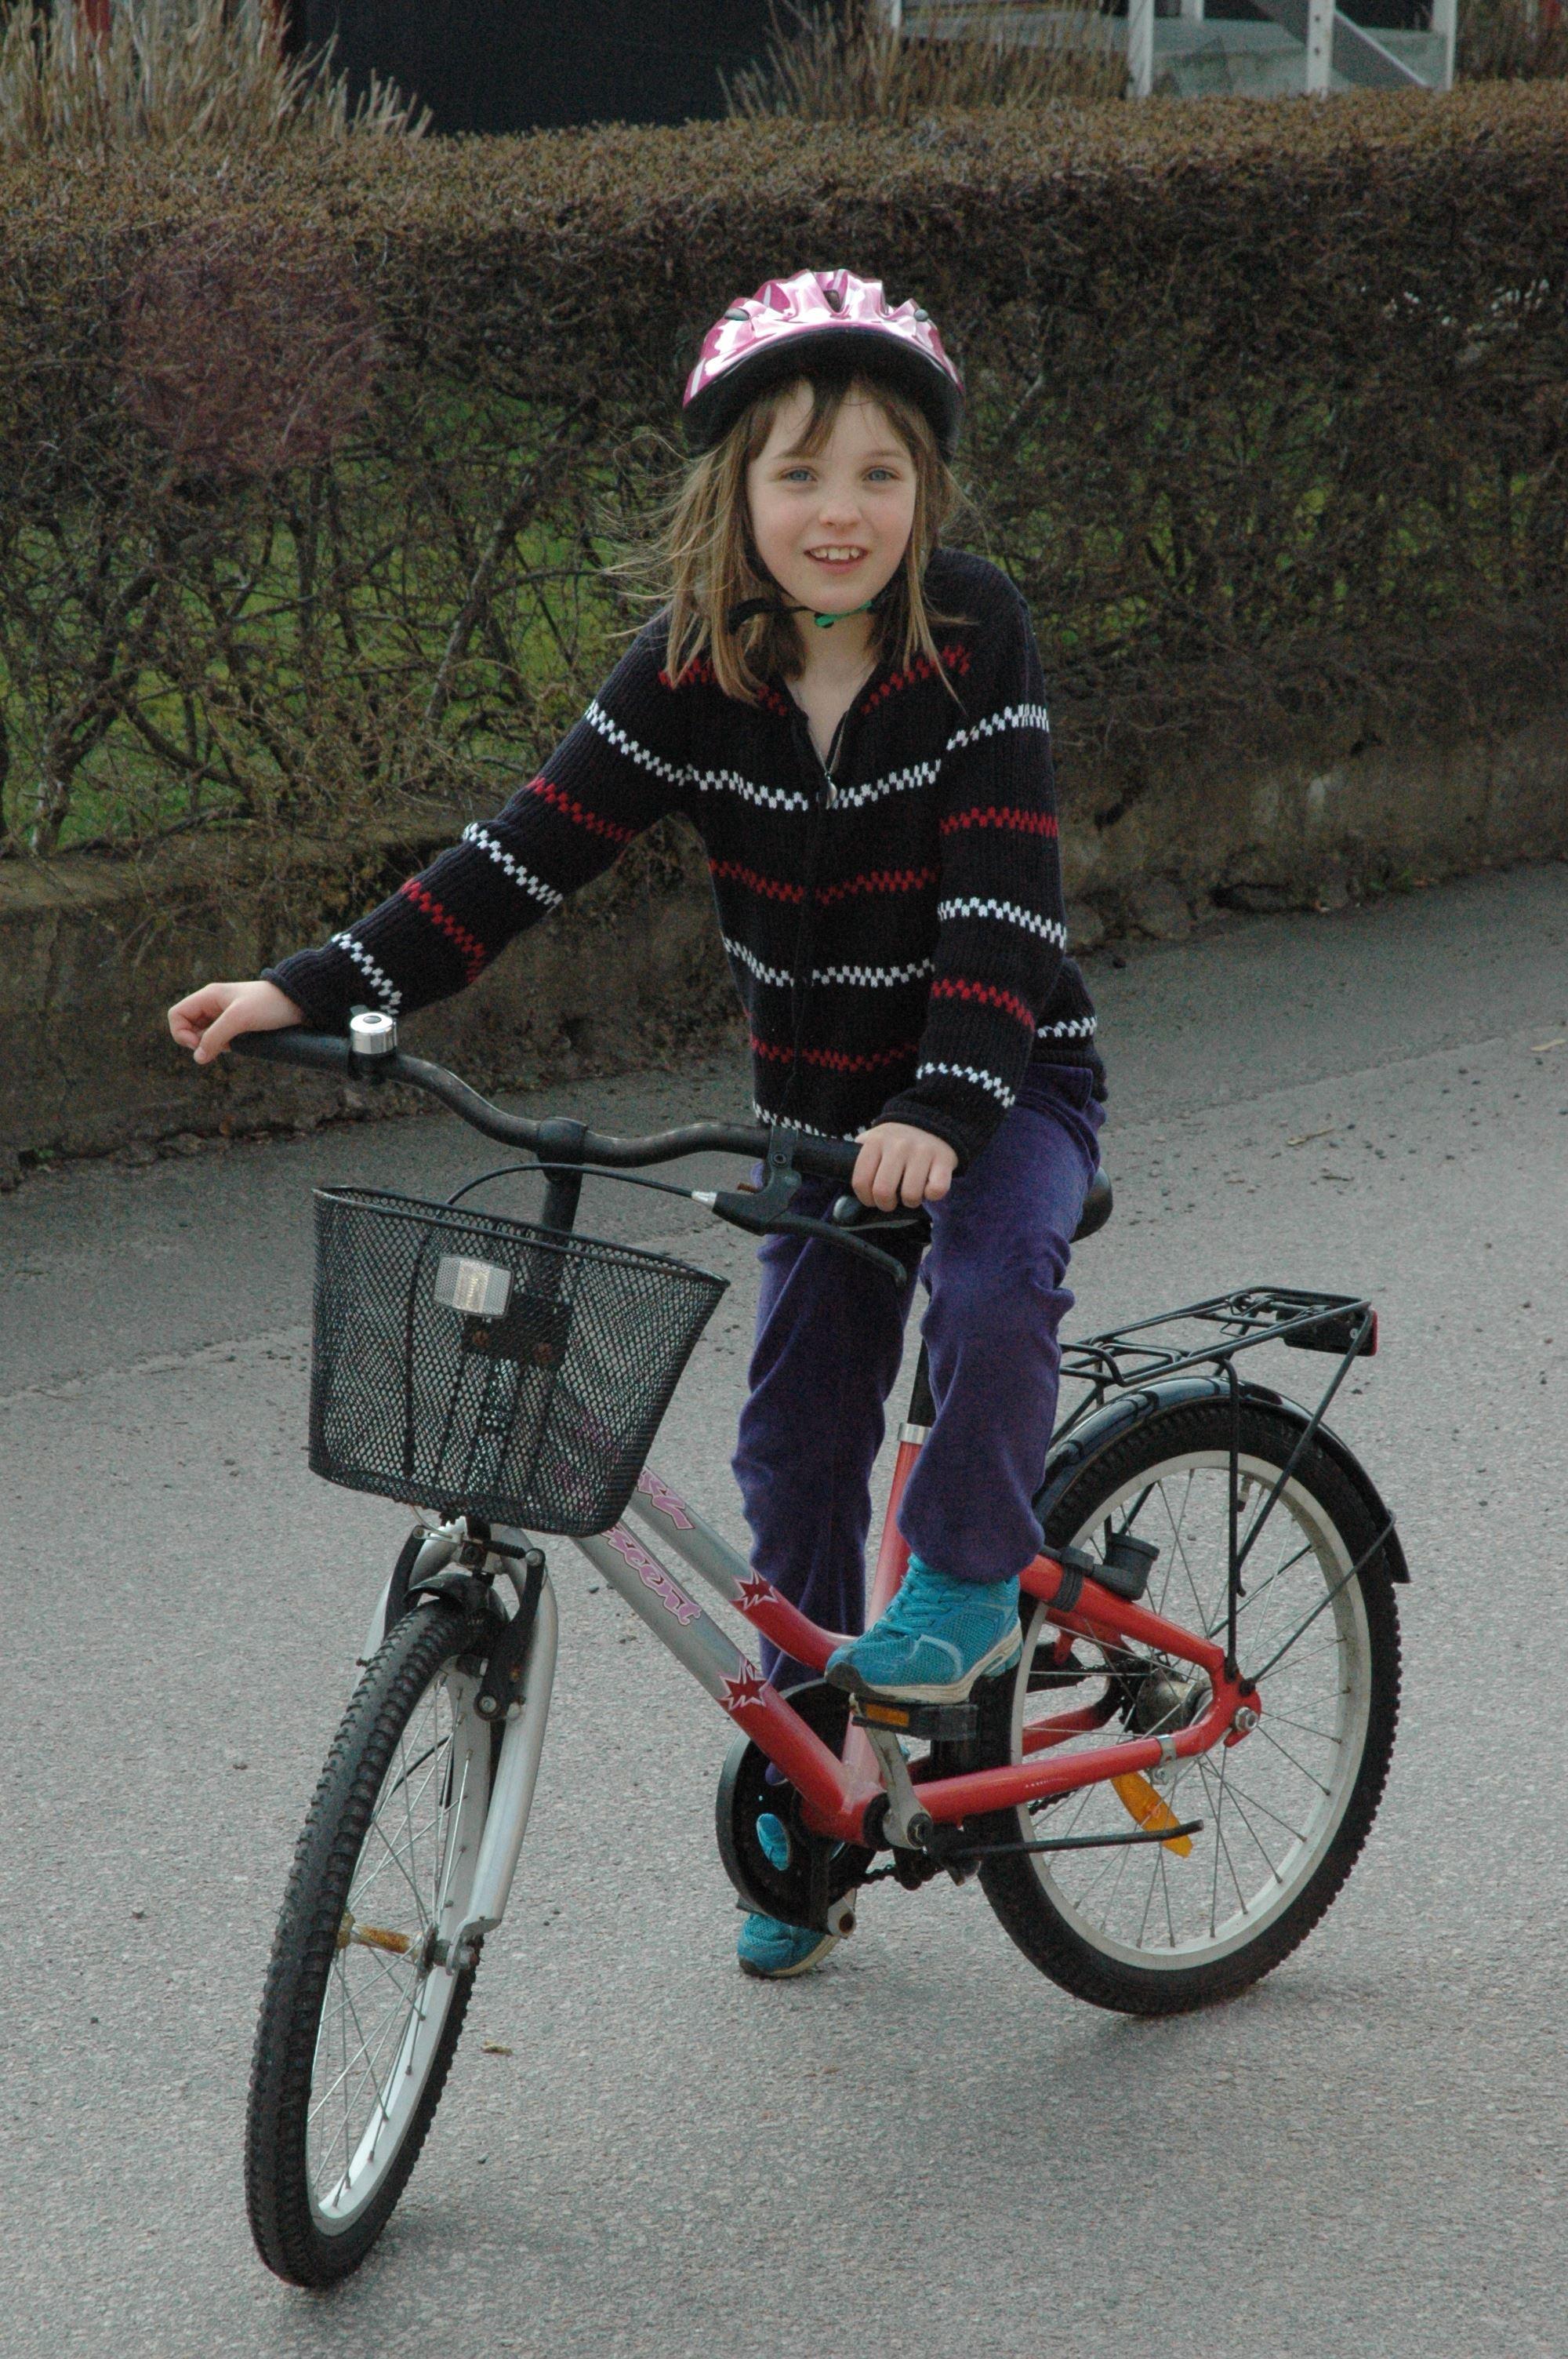 Cykeltur runt södra Bergundasjön, 11 km